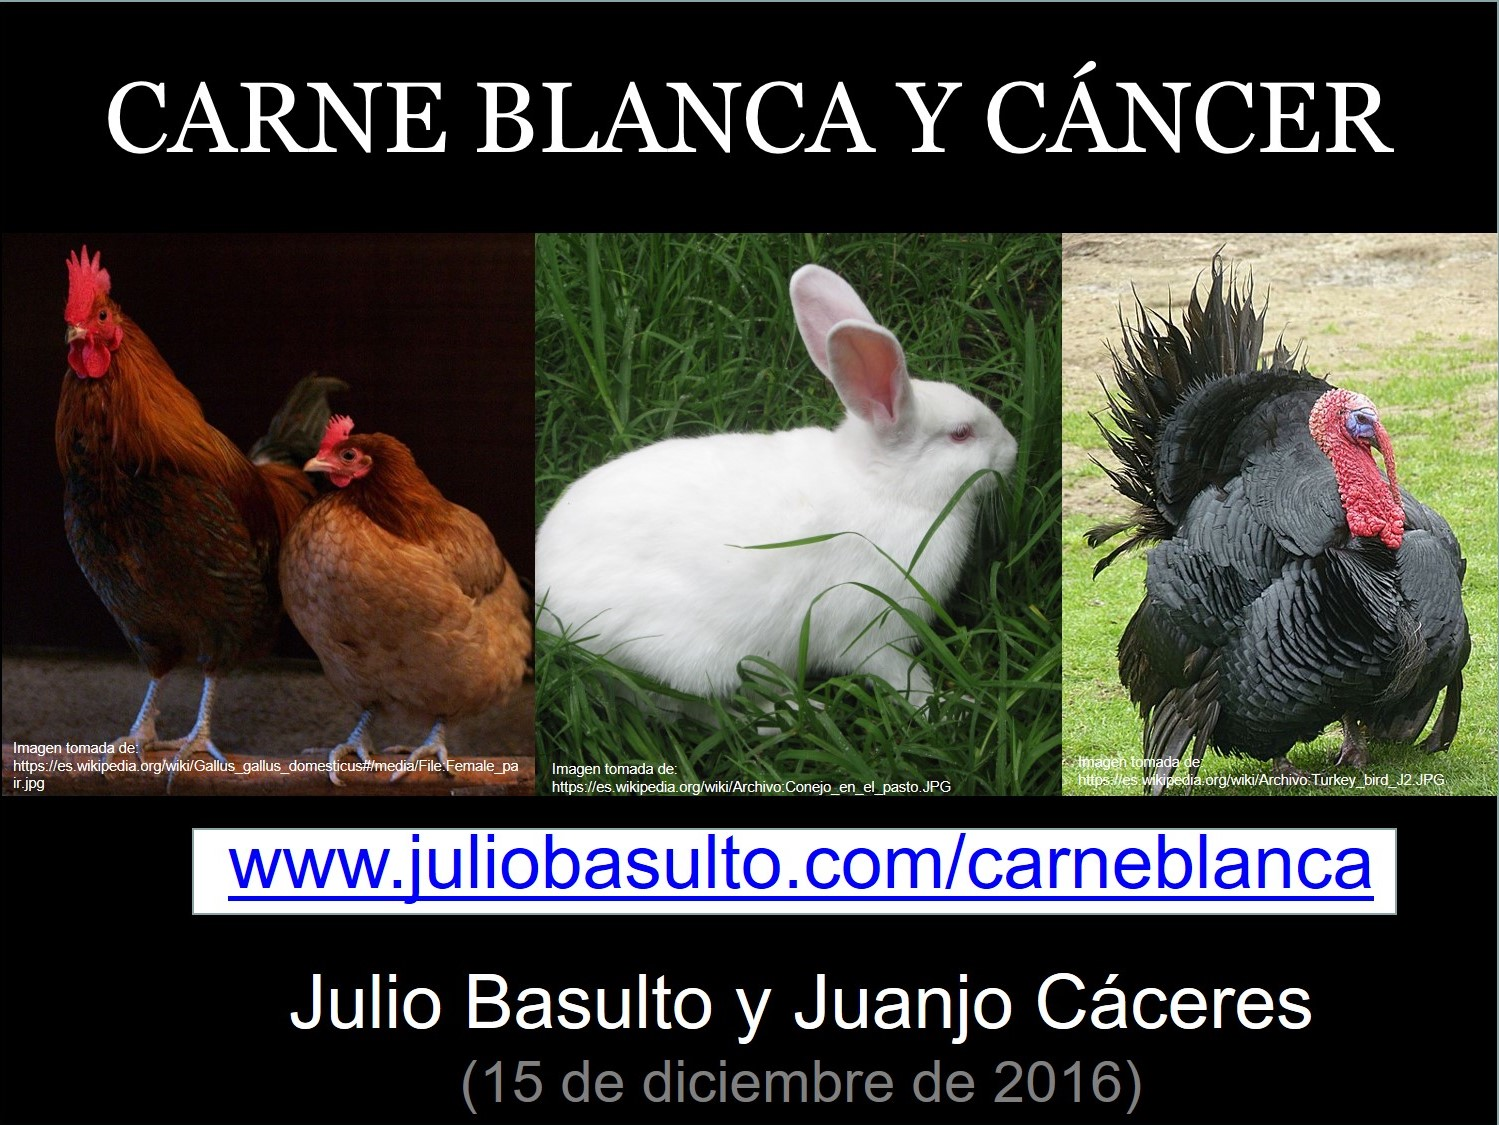 Carne blanca y cáncer